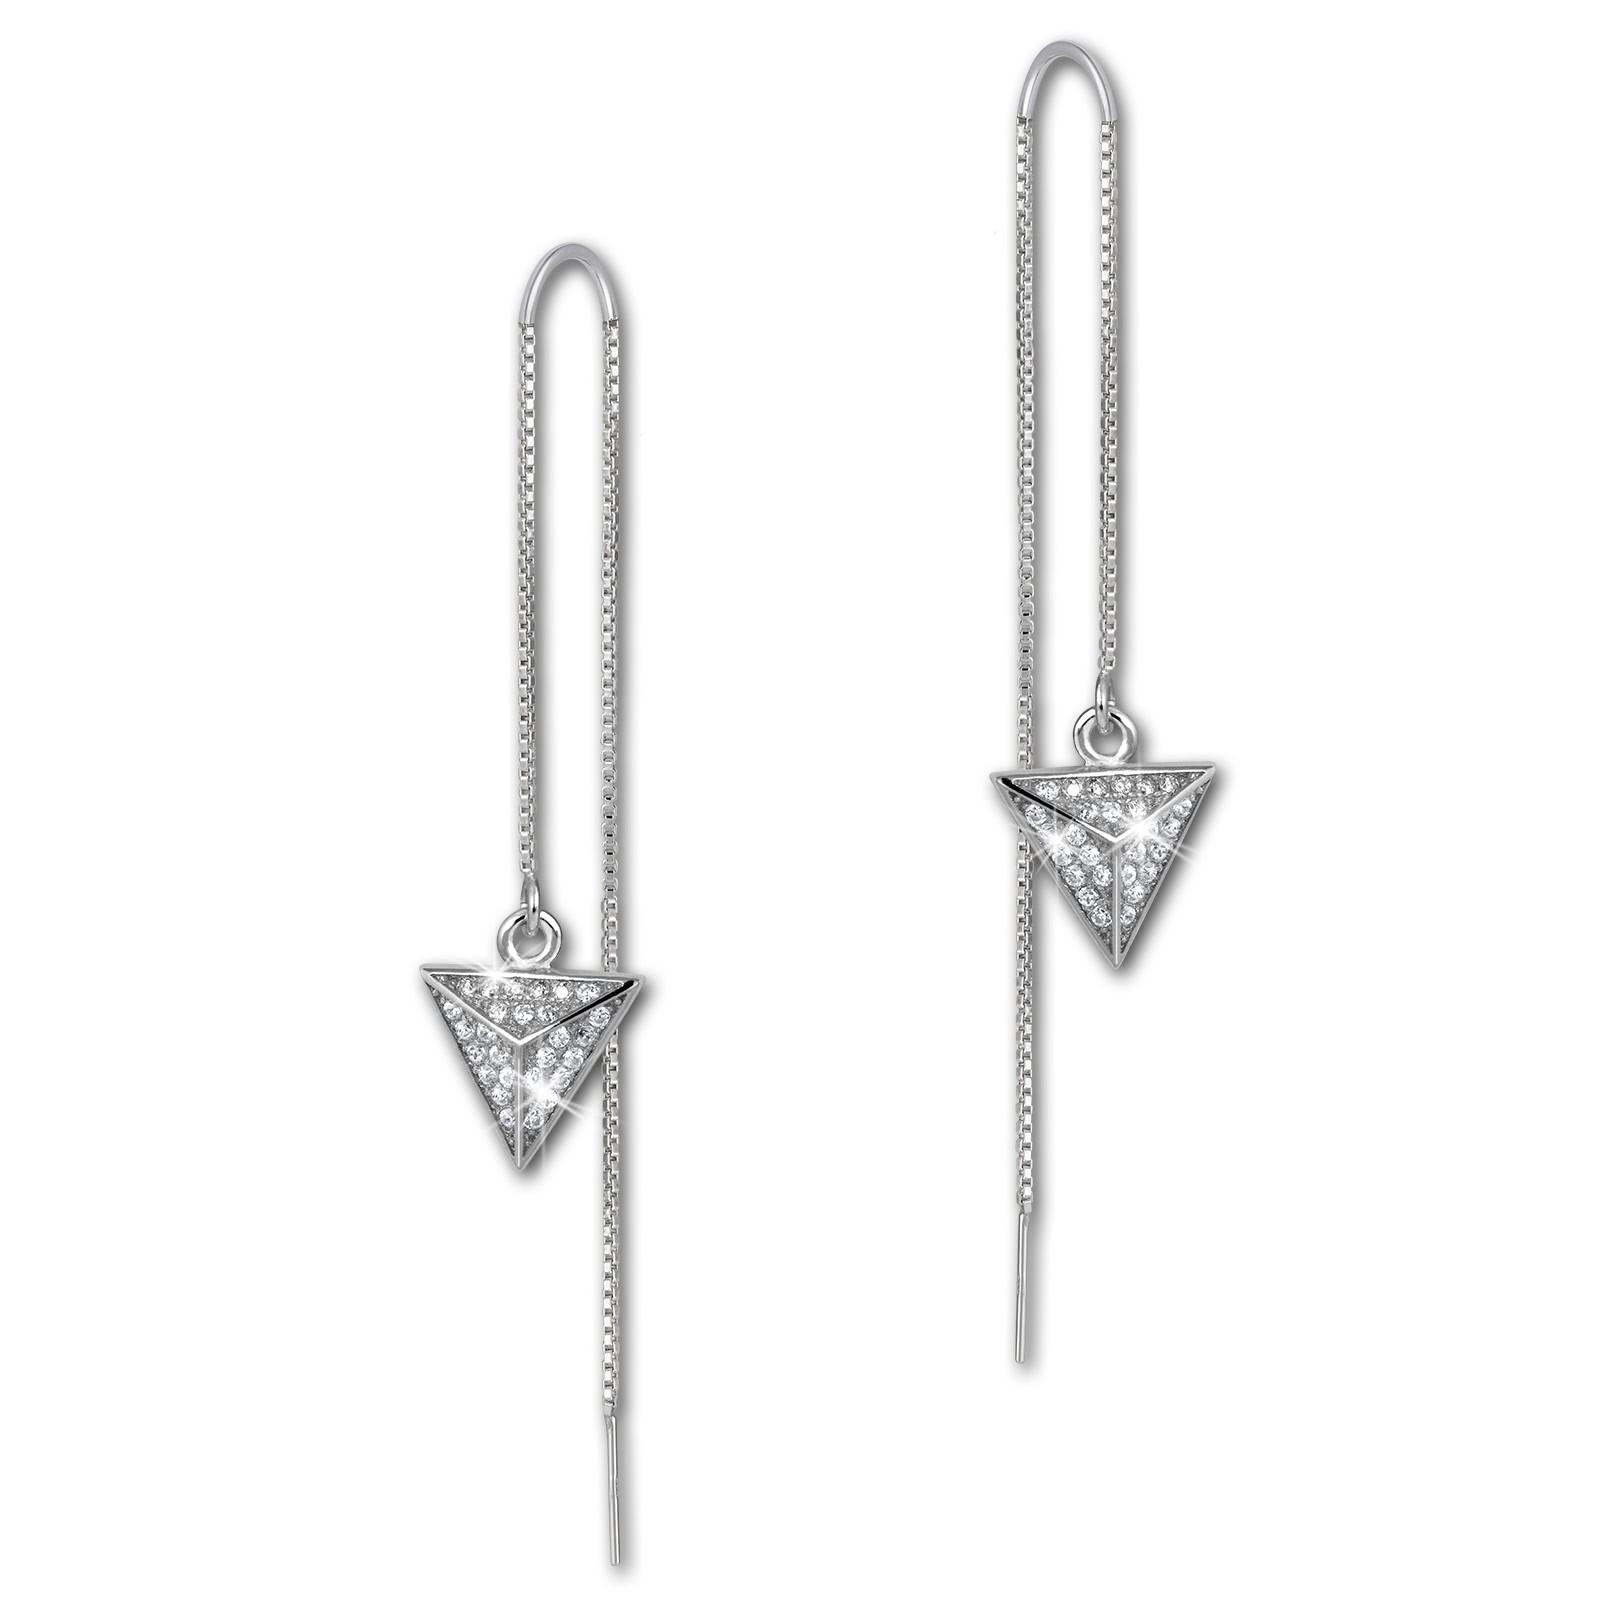 SilberDream Glitzer Ohrhänger Dreieck Zirkonia weiß 925er Silber Ohrring GSO441W